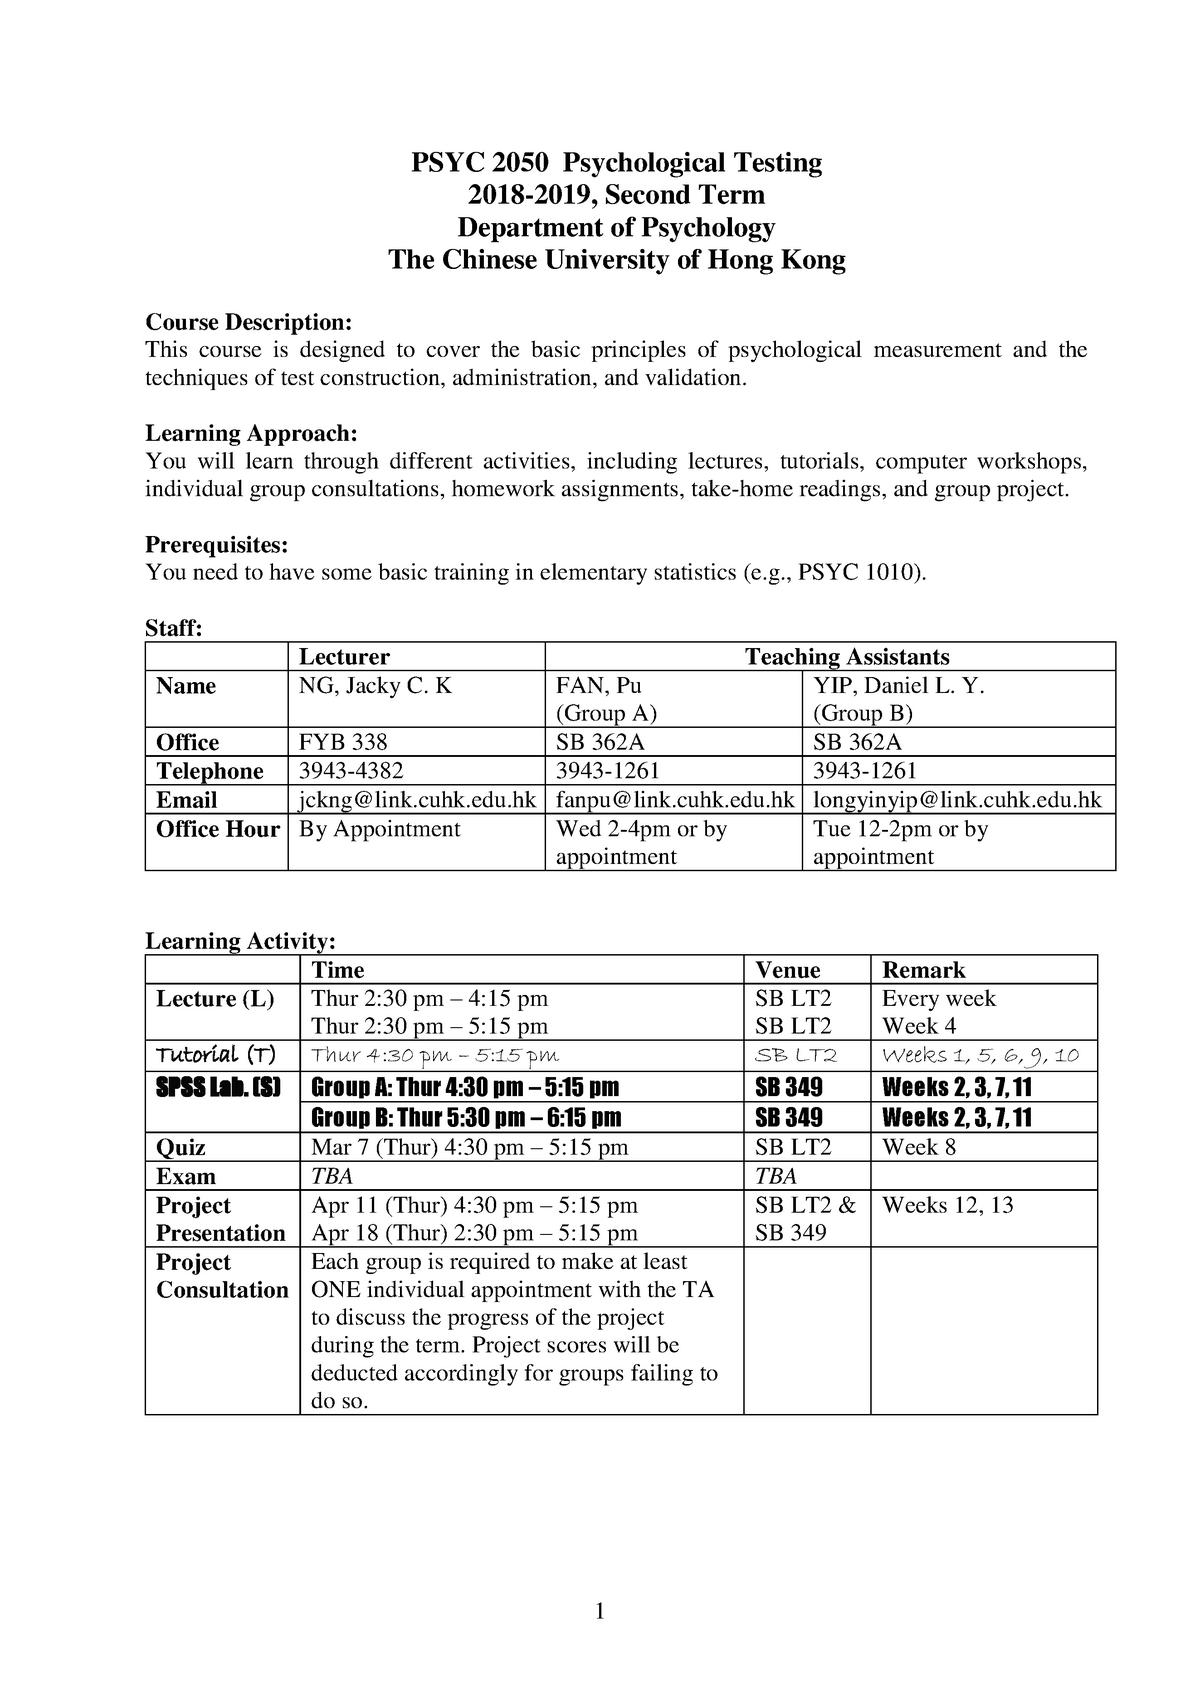 PSYC2050 Course outline - Psychological Testing - CUHK - StuDocu